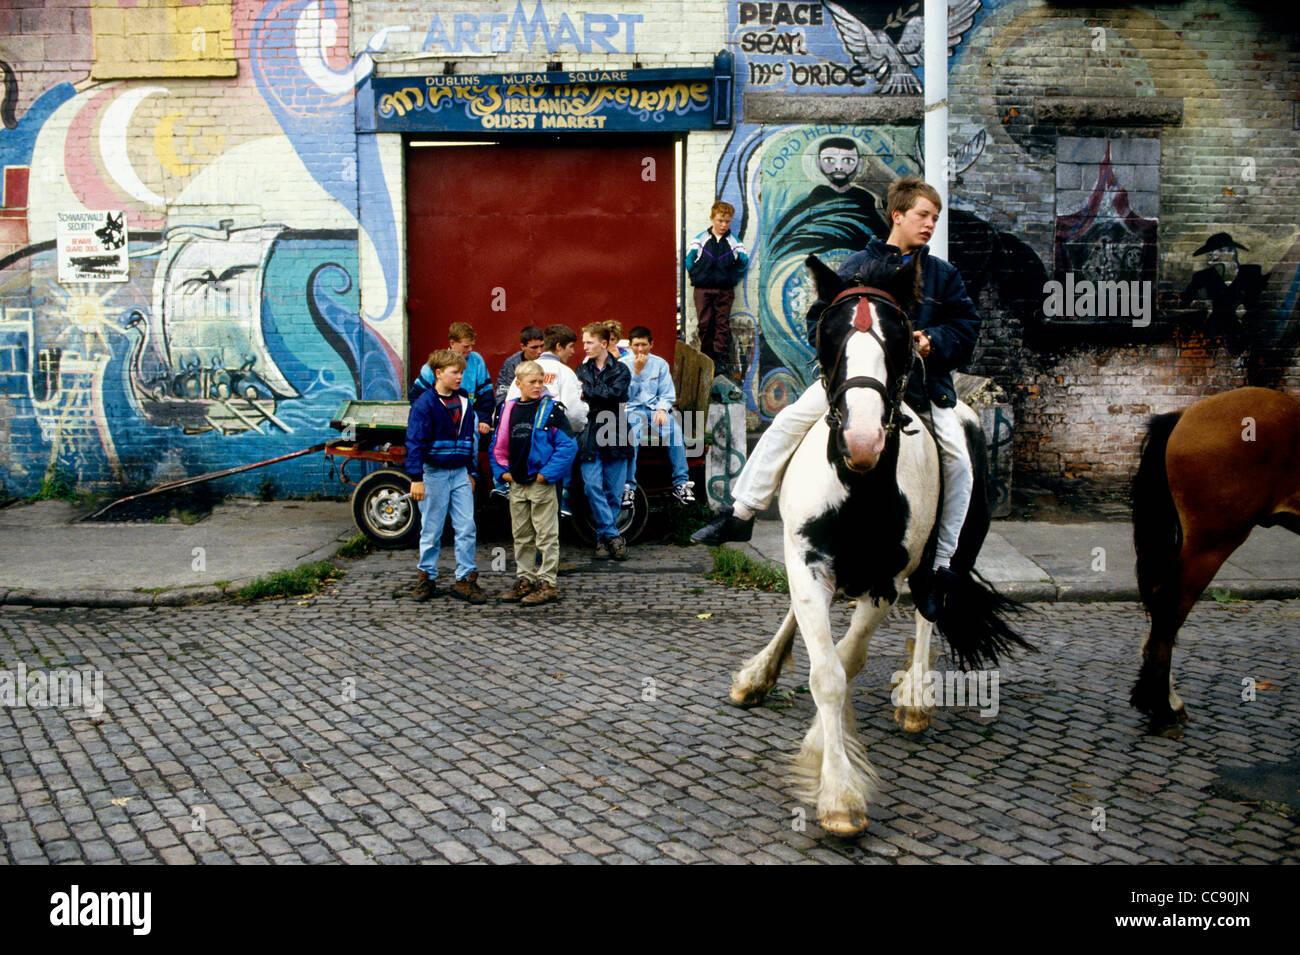 Boys show off their skills with ponies in Dublin's Smithfield Market -Ireland - Stock Image